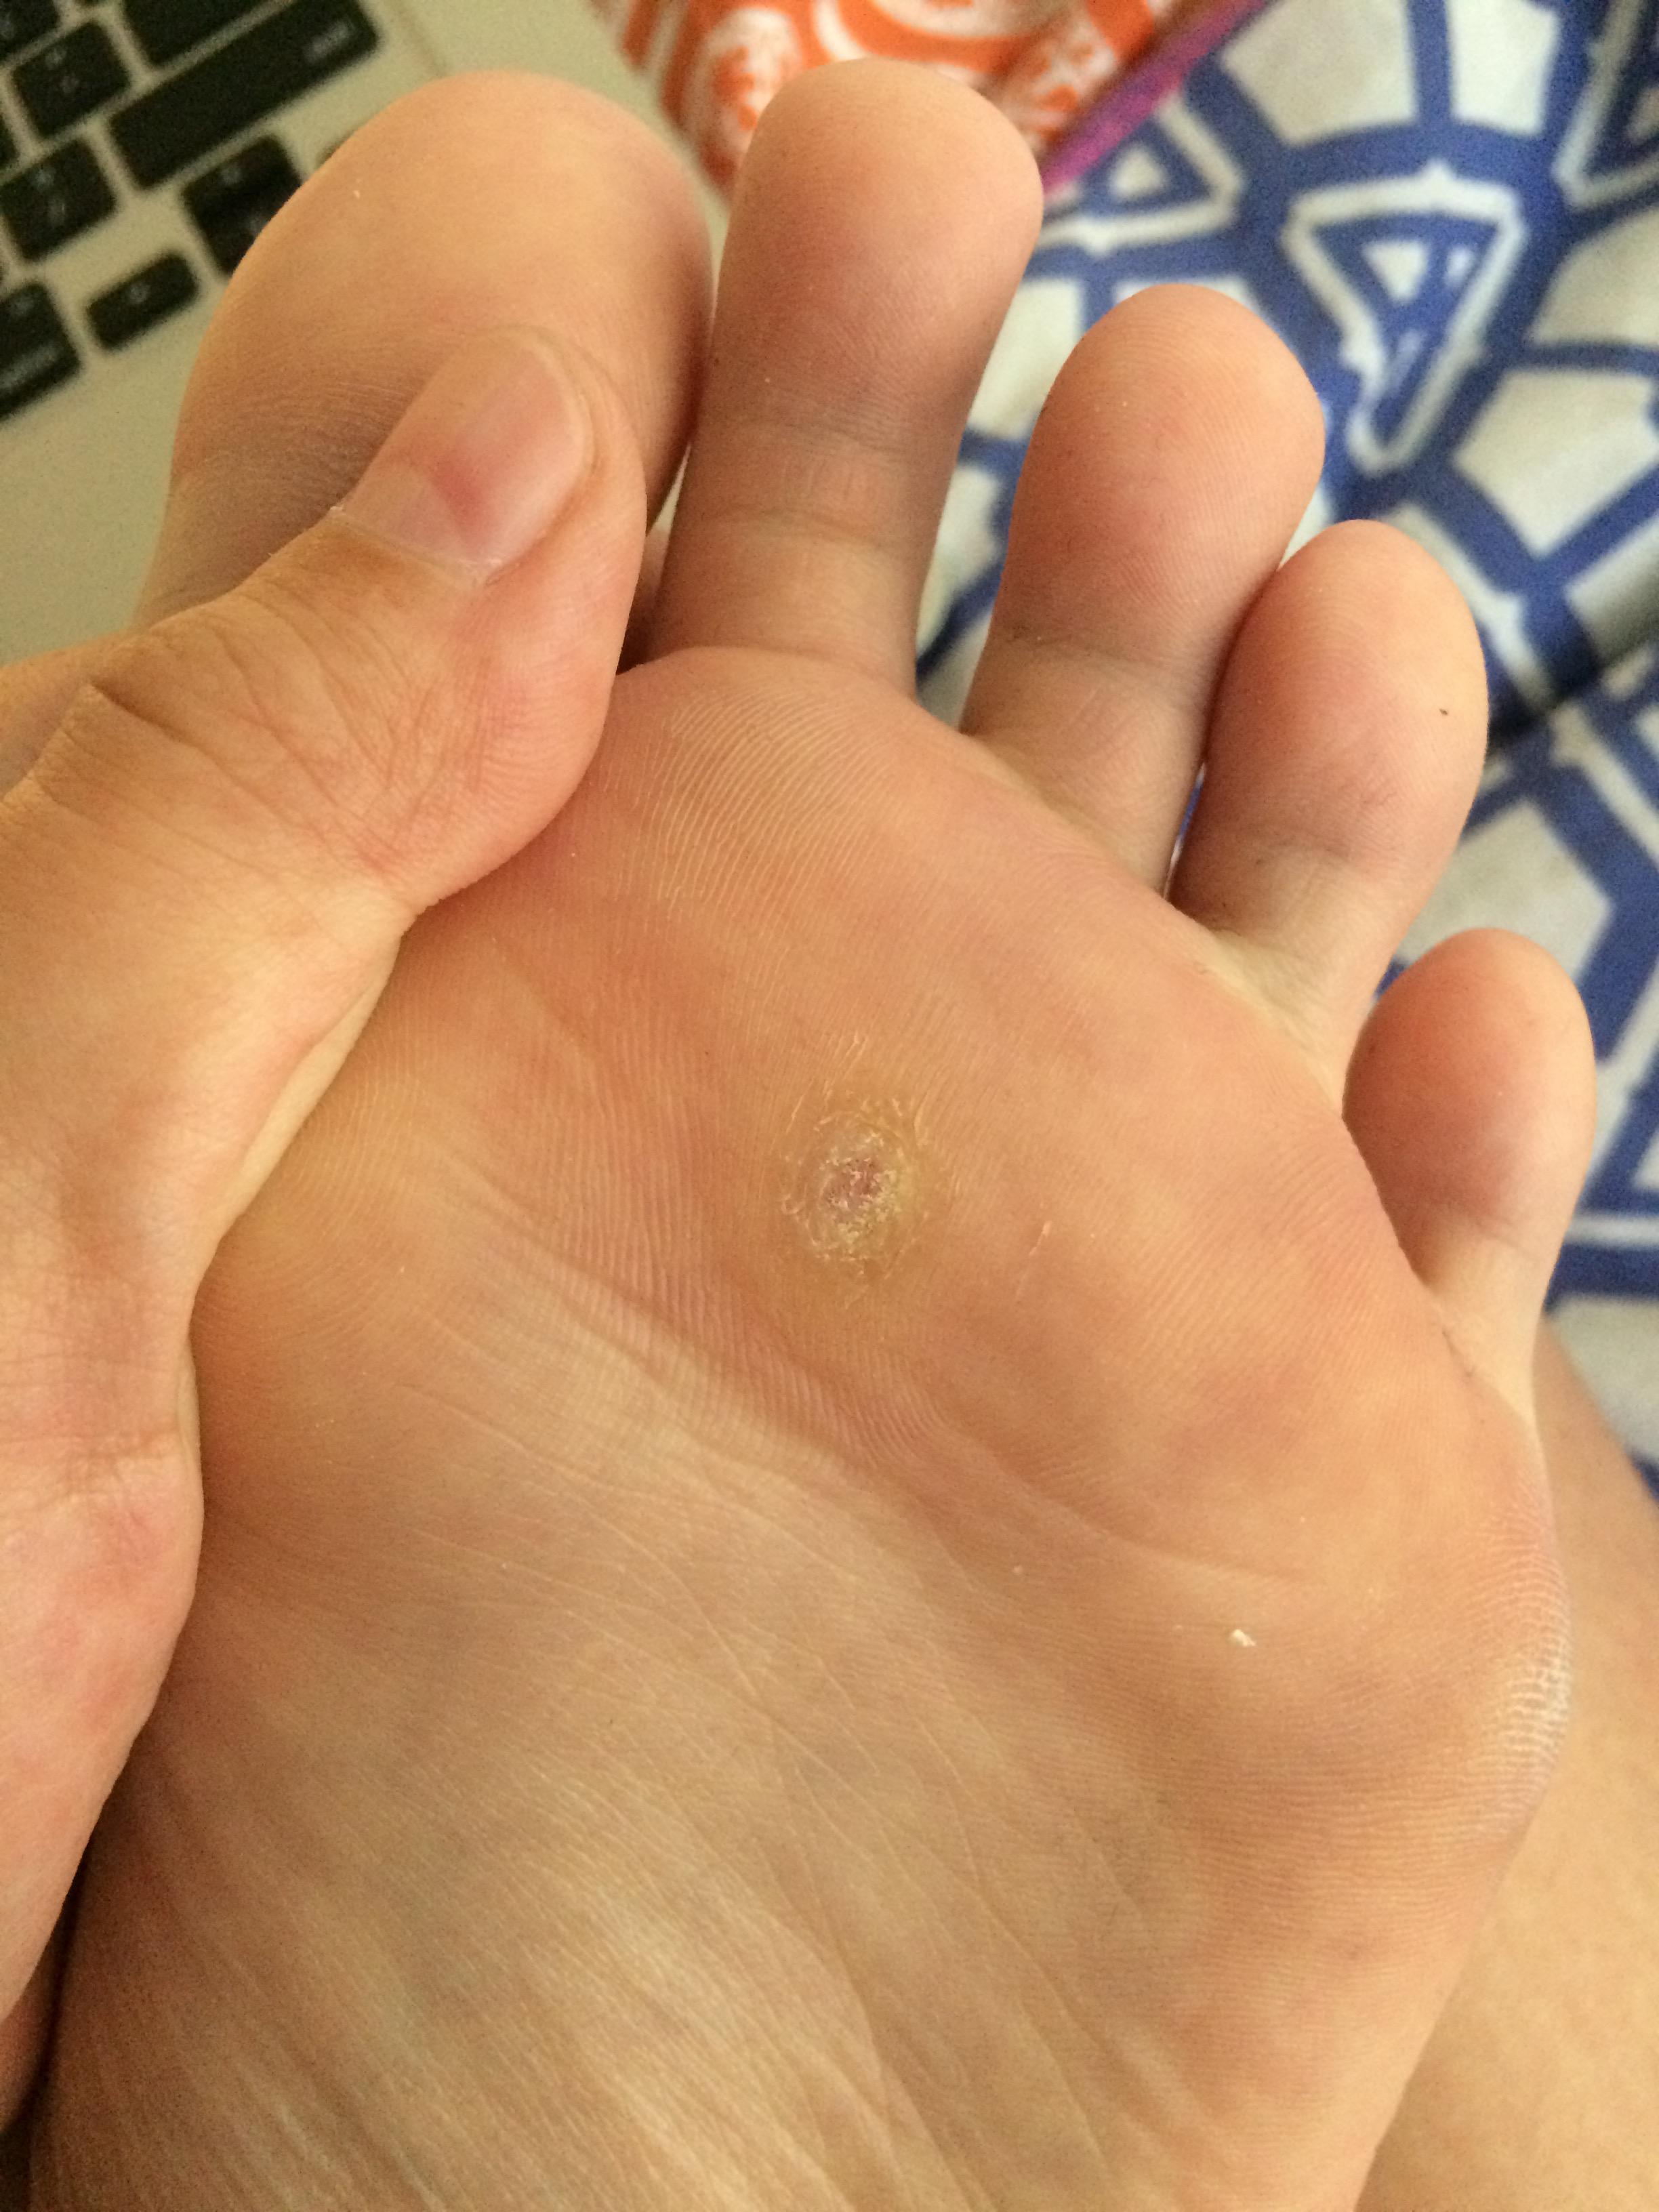 foot verruca duct tape